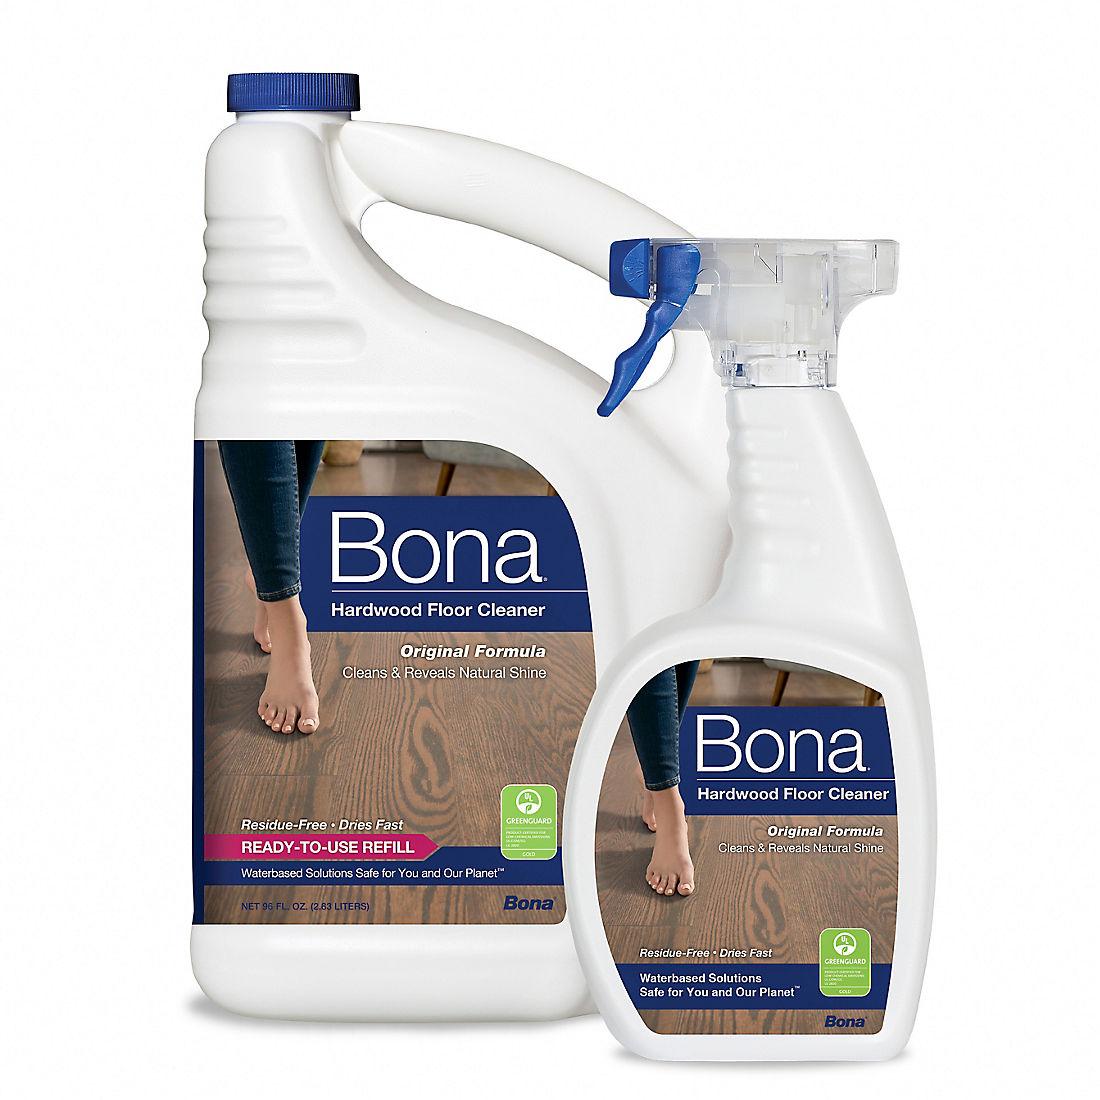 Bona Hardwood Floor Cleaner 22 Oz